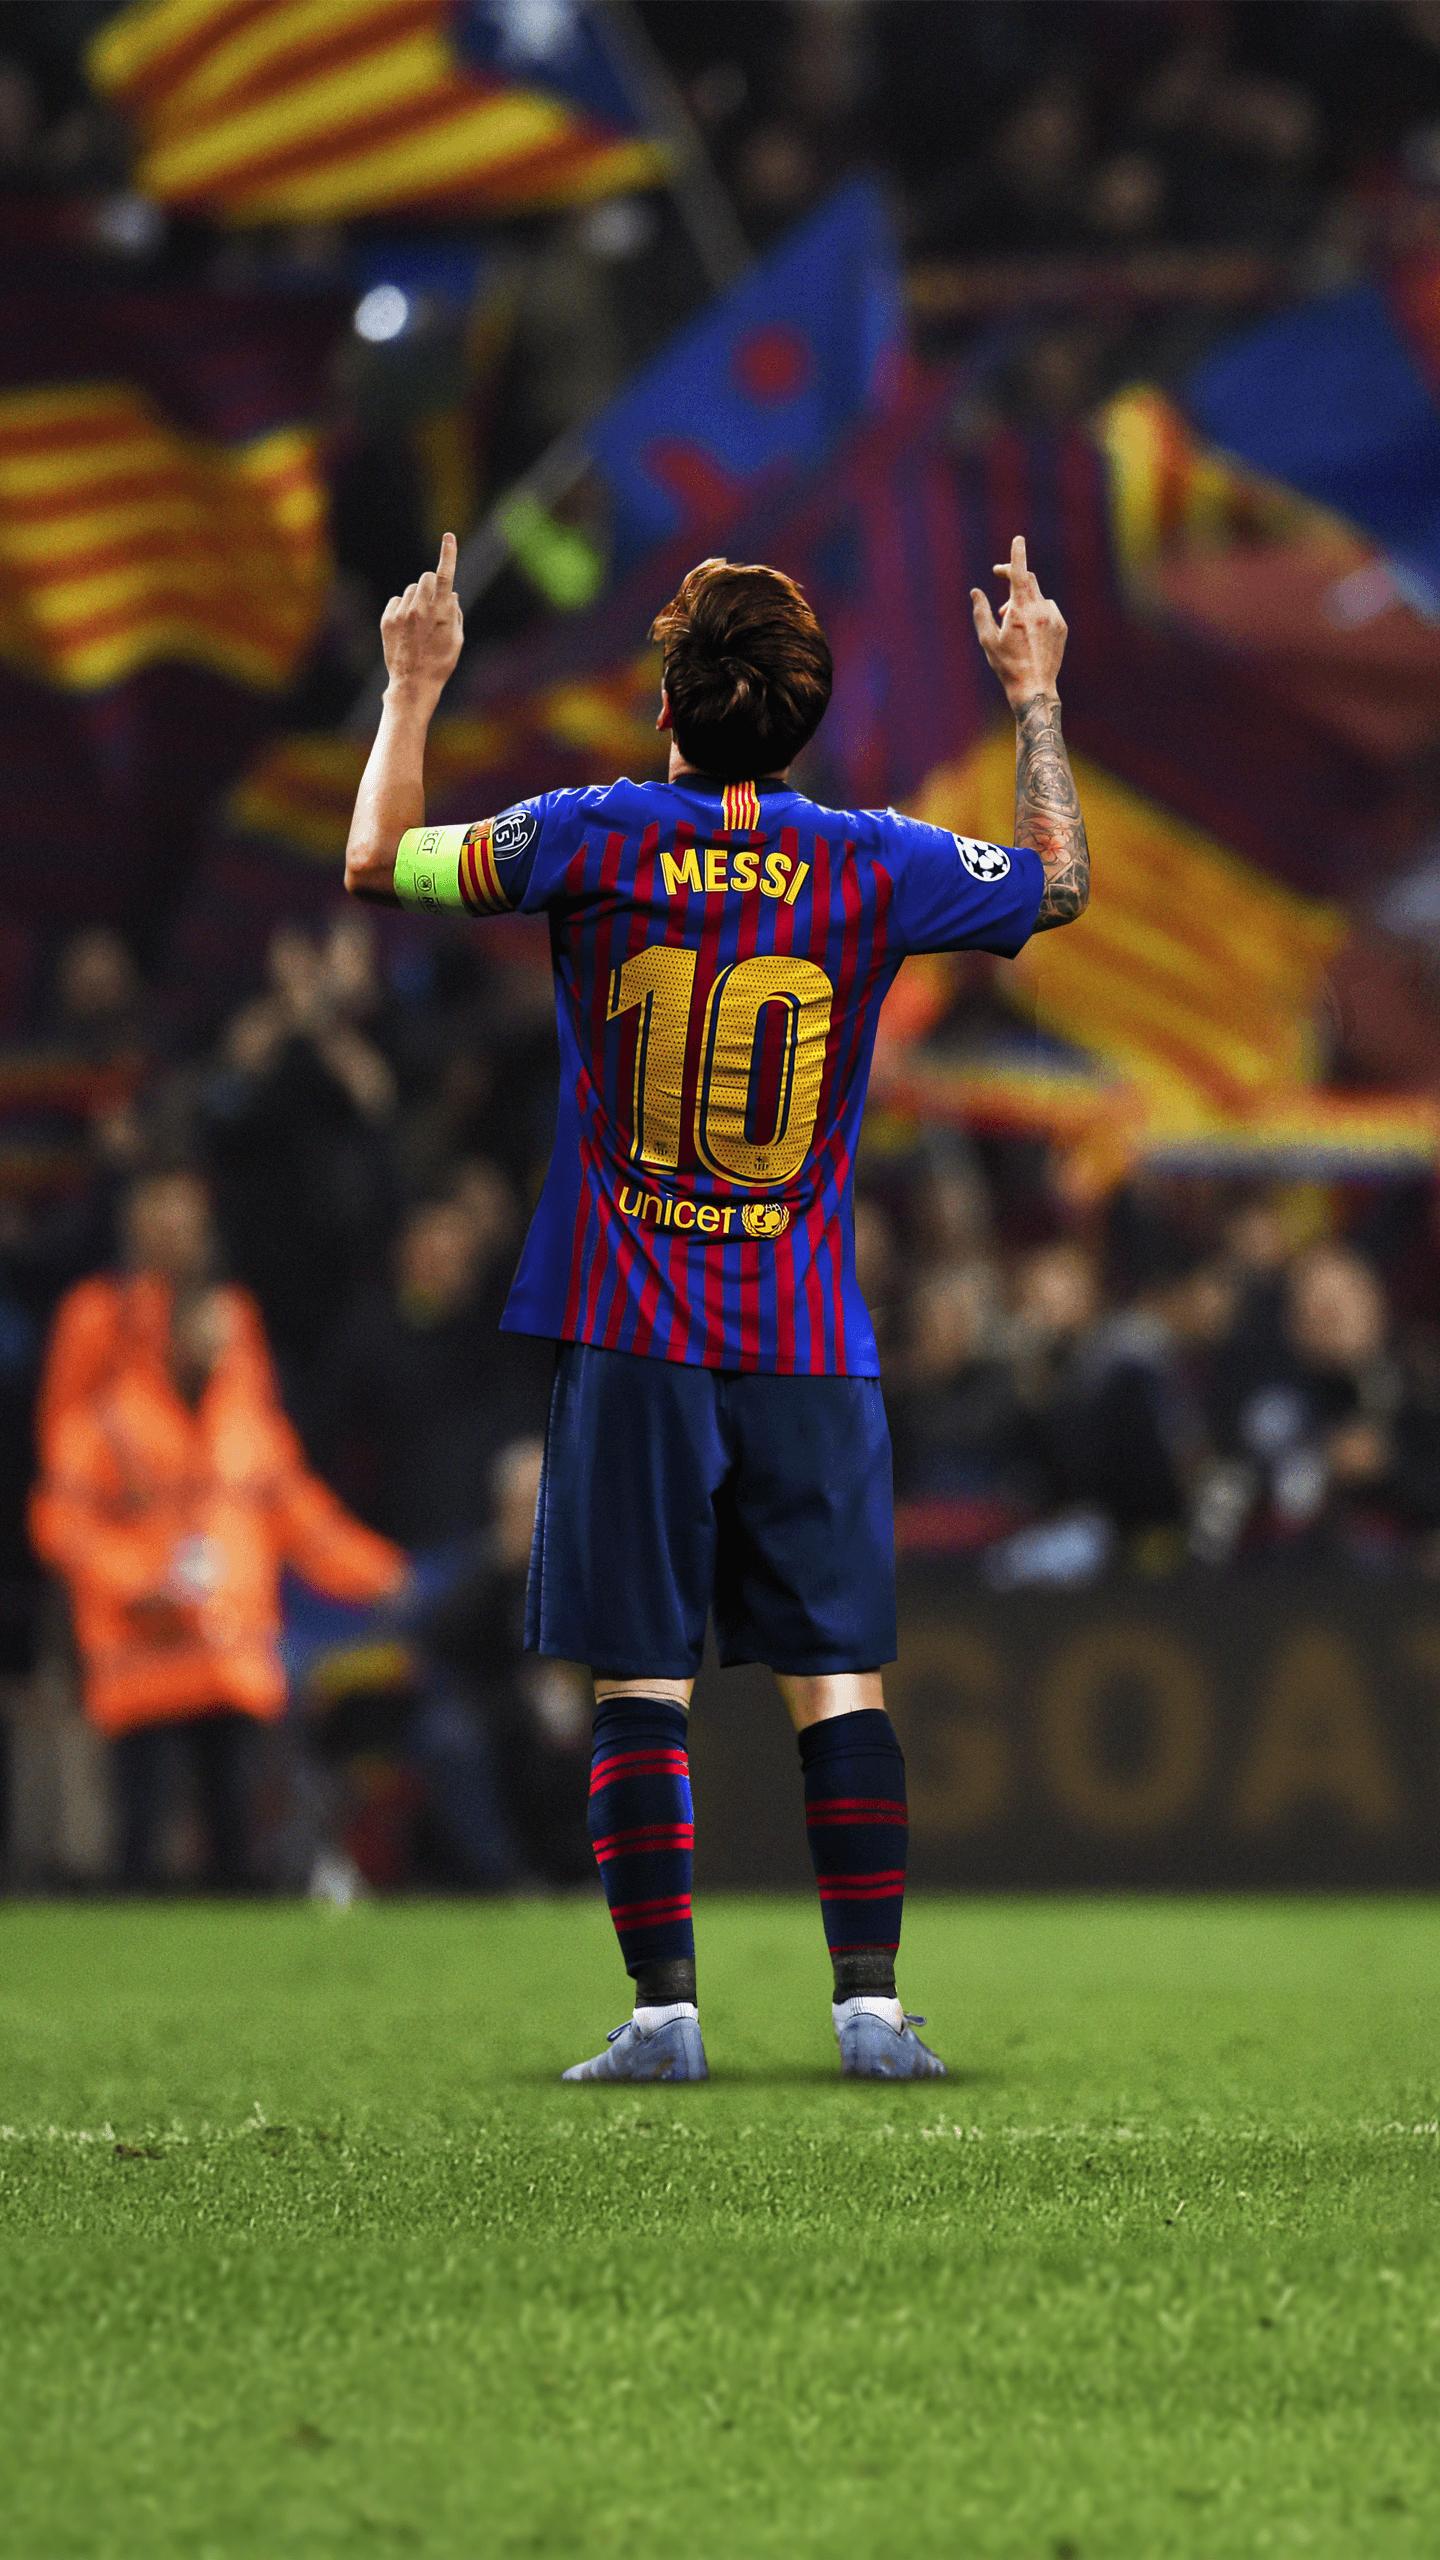 Leo Messi 2019 Wallpapers - Wallpaper Cave